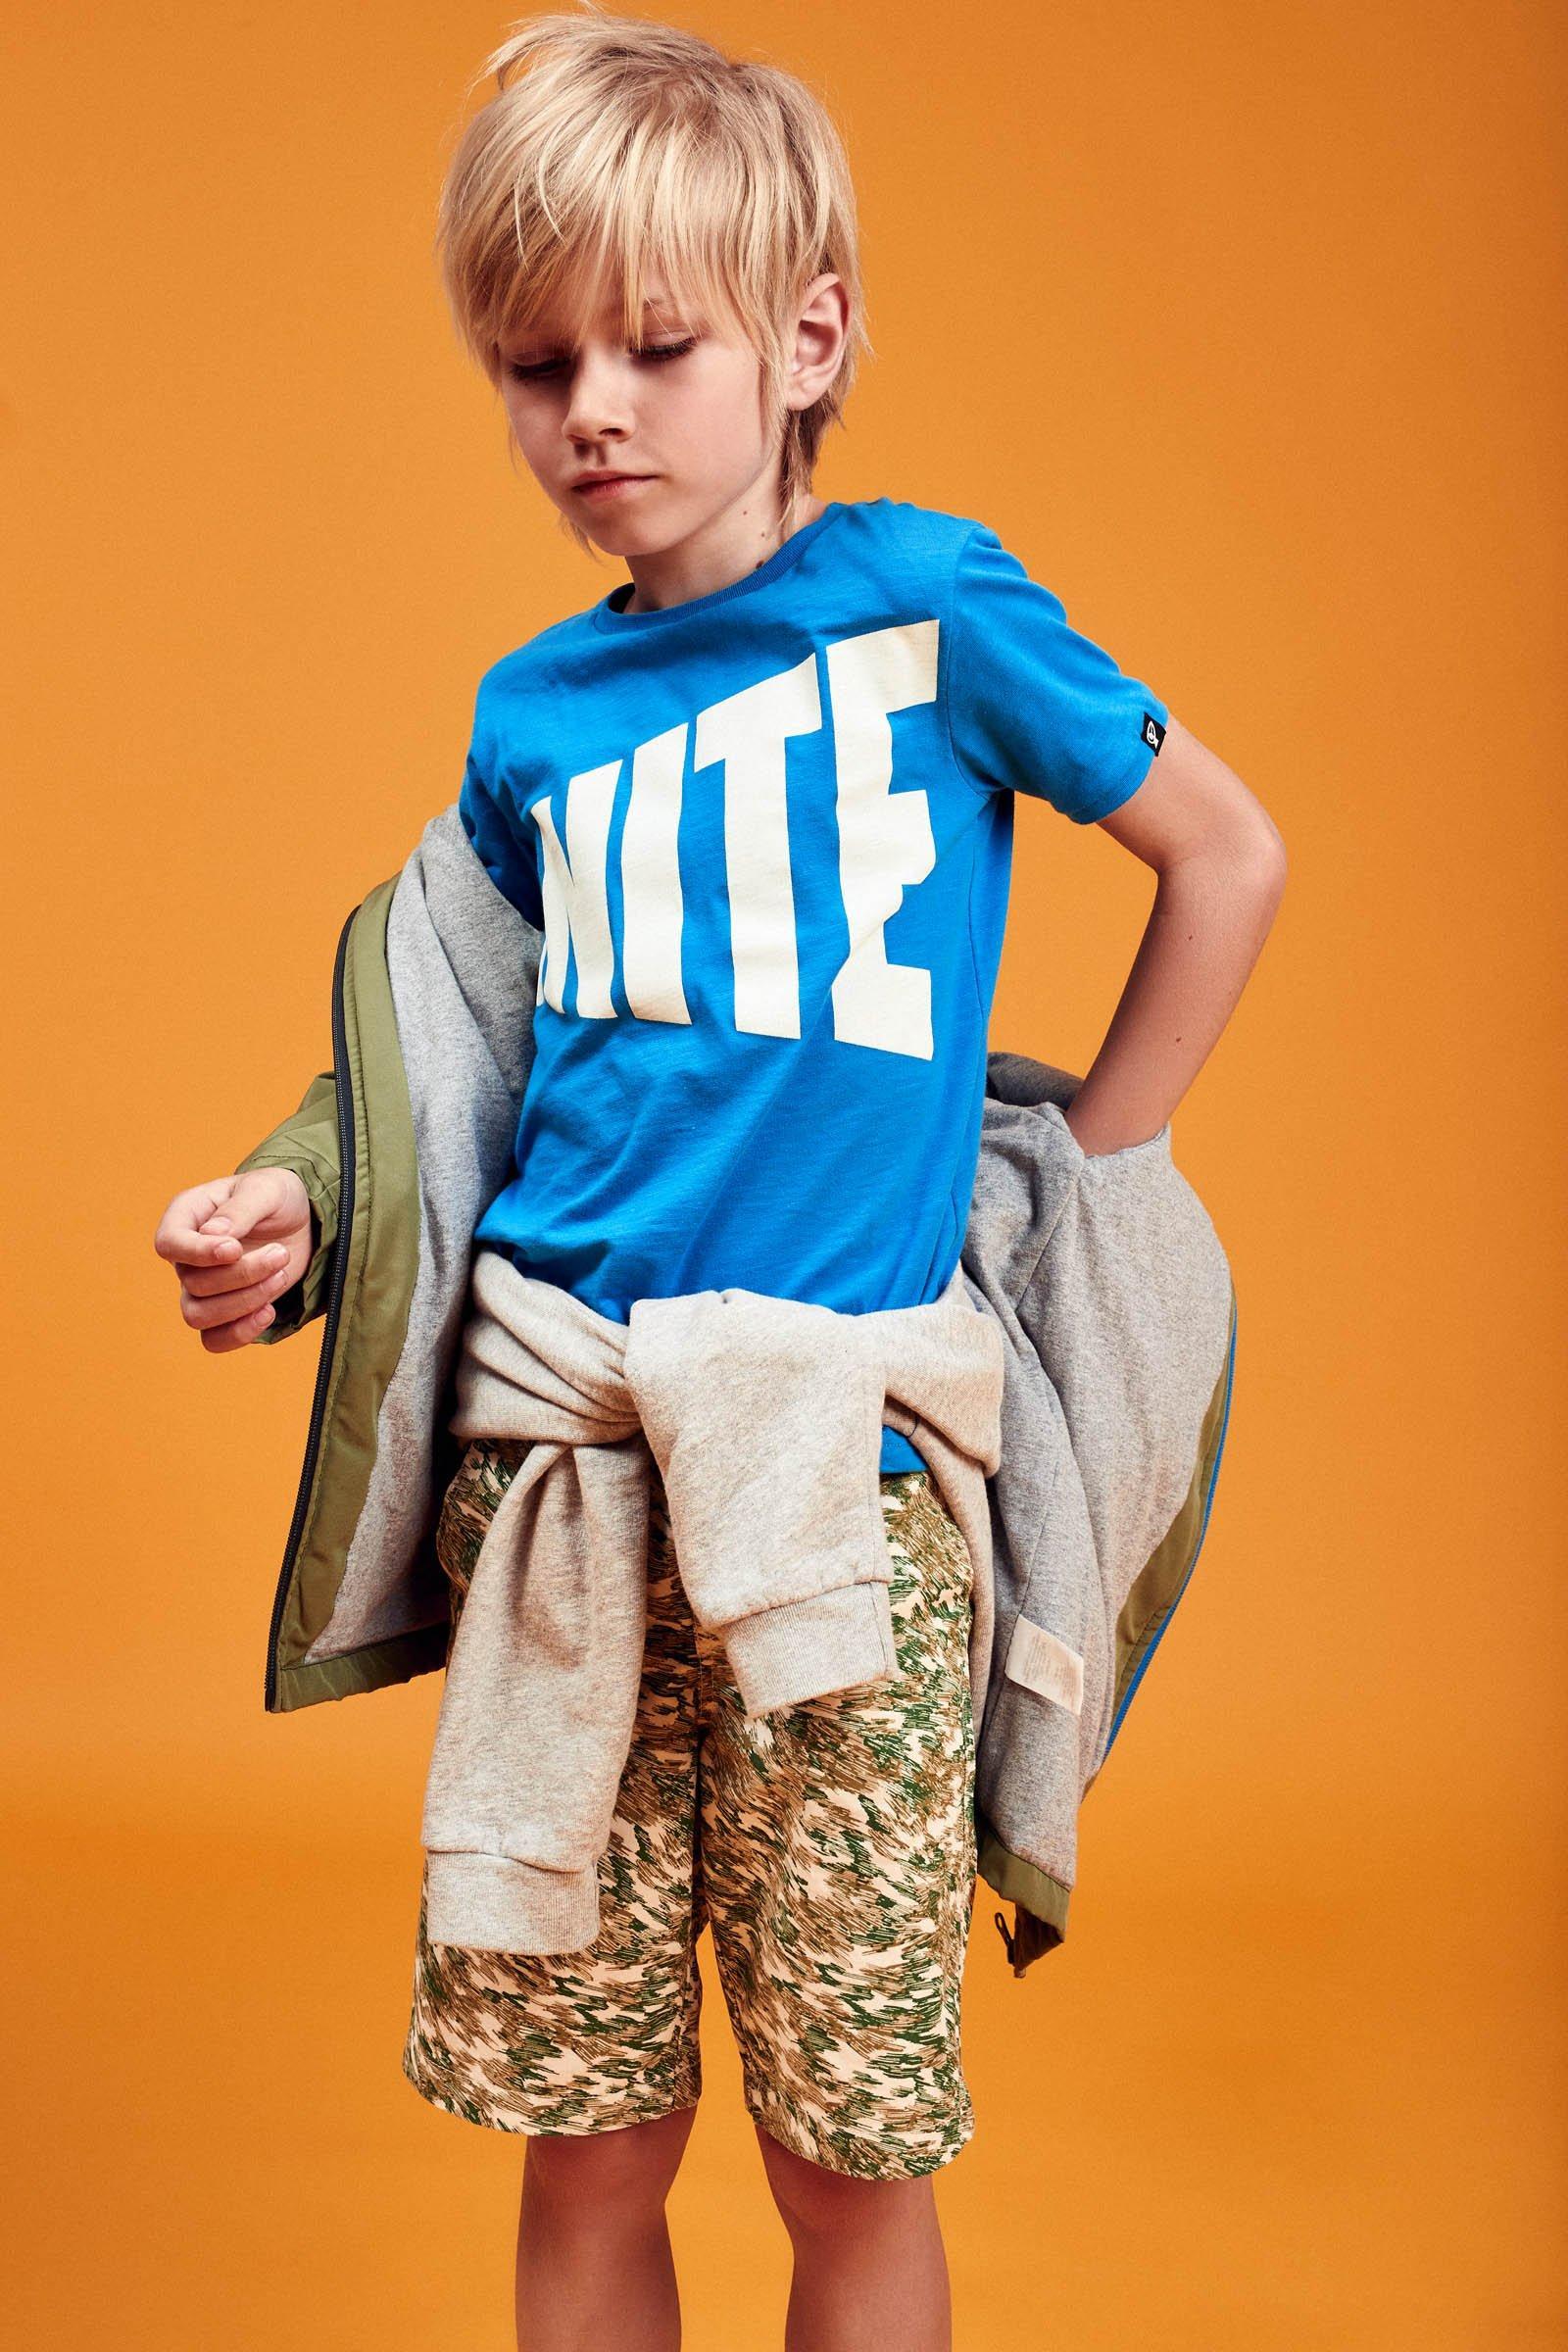 CKS Kids - YEMIEL - t-shirt korte mouwen - blauw